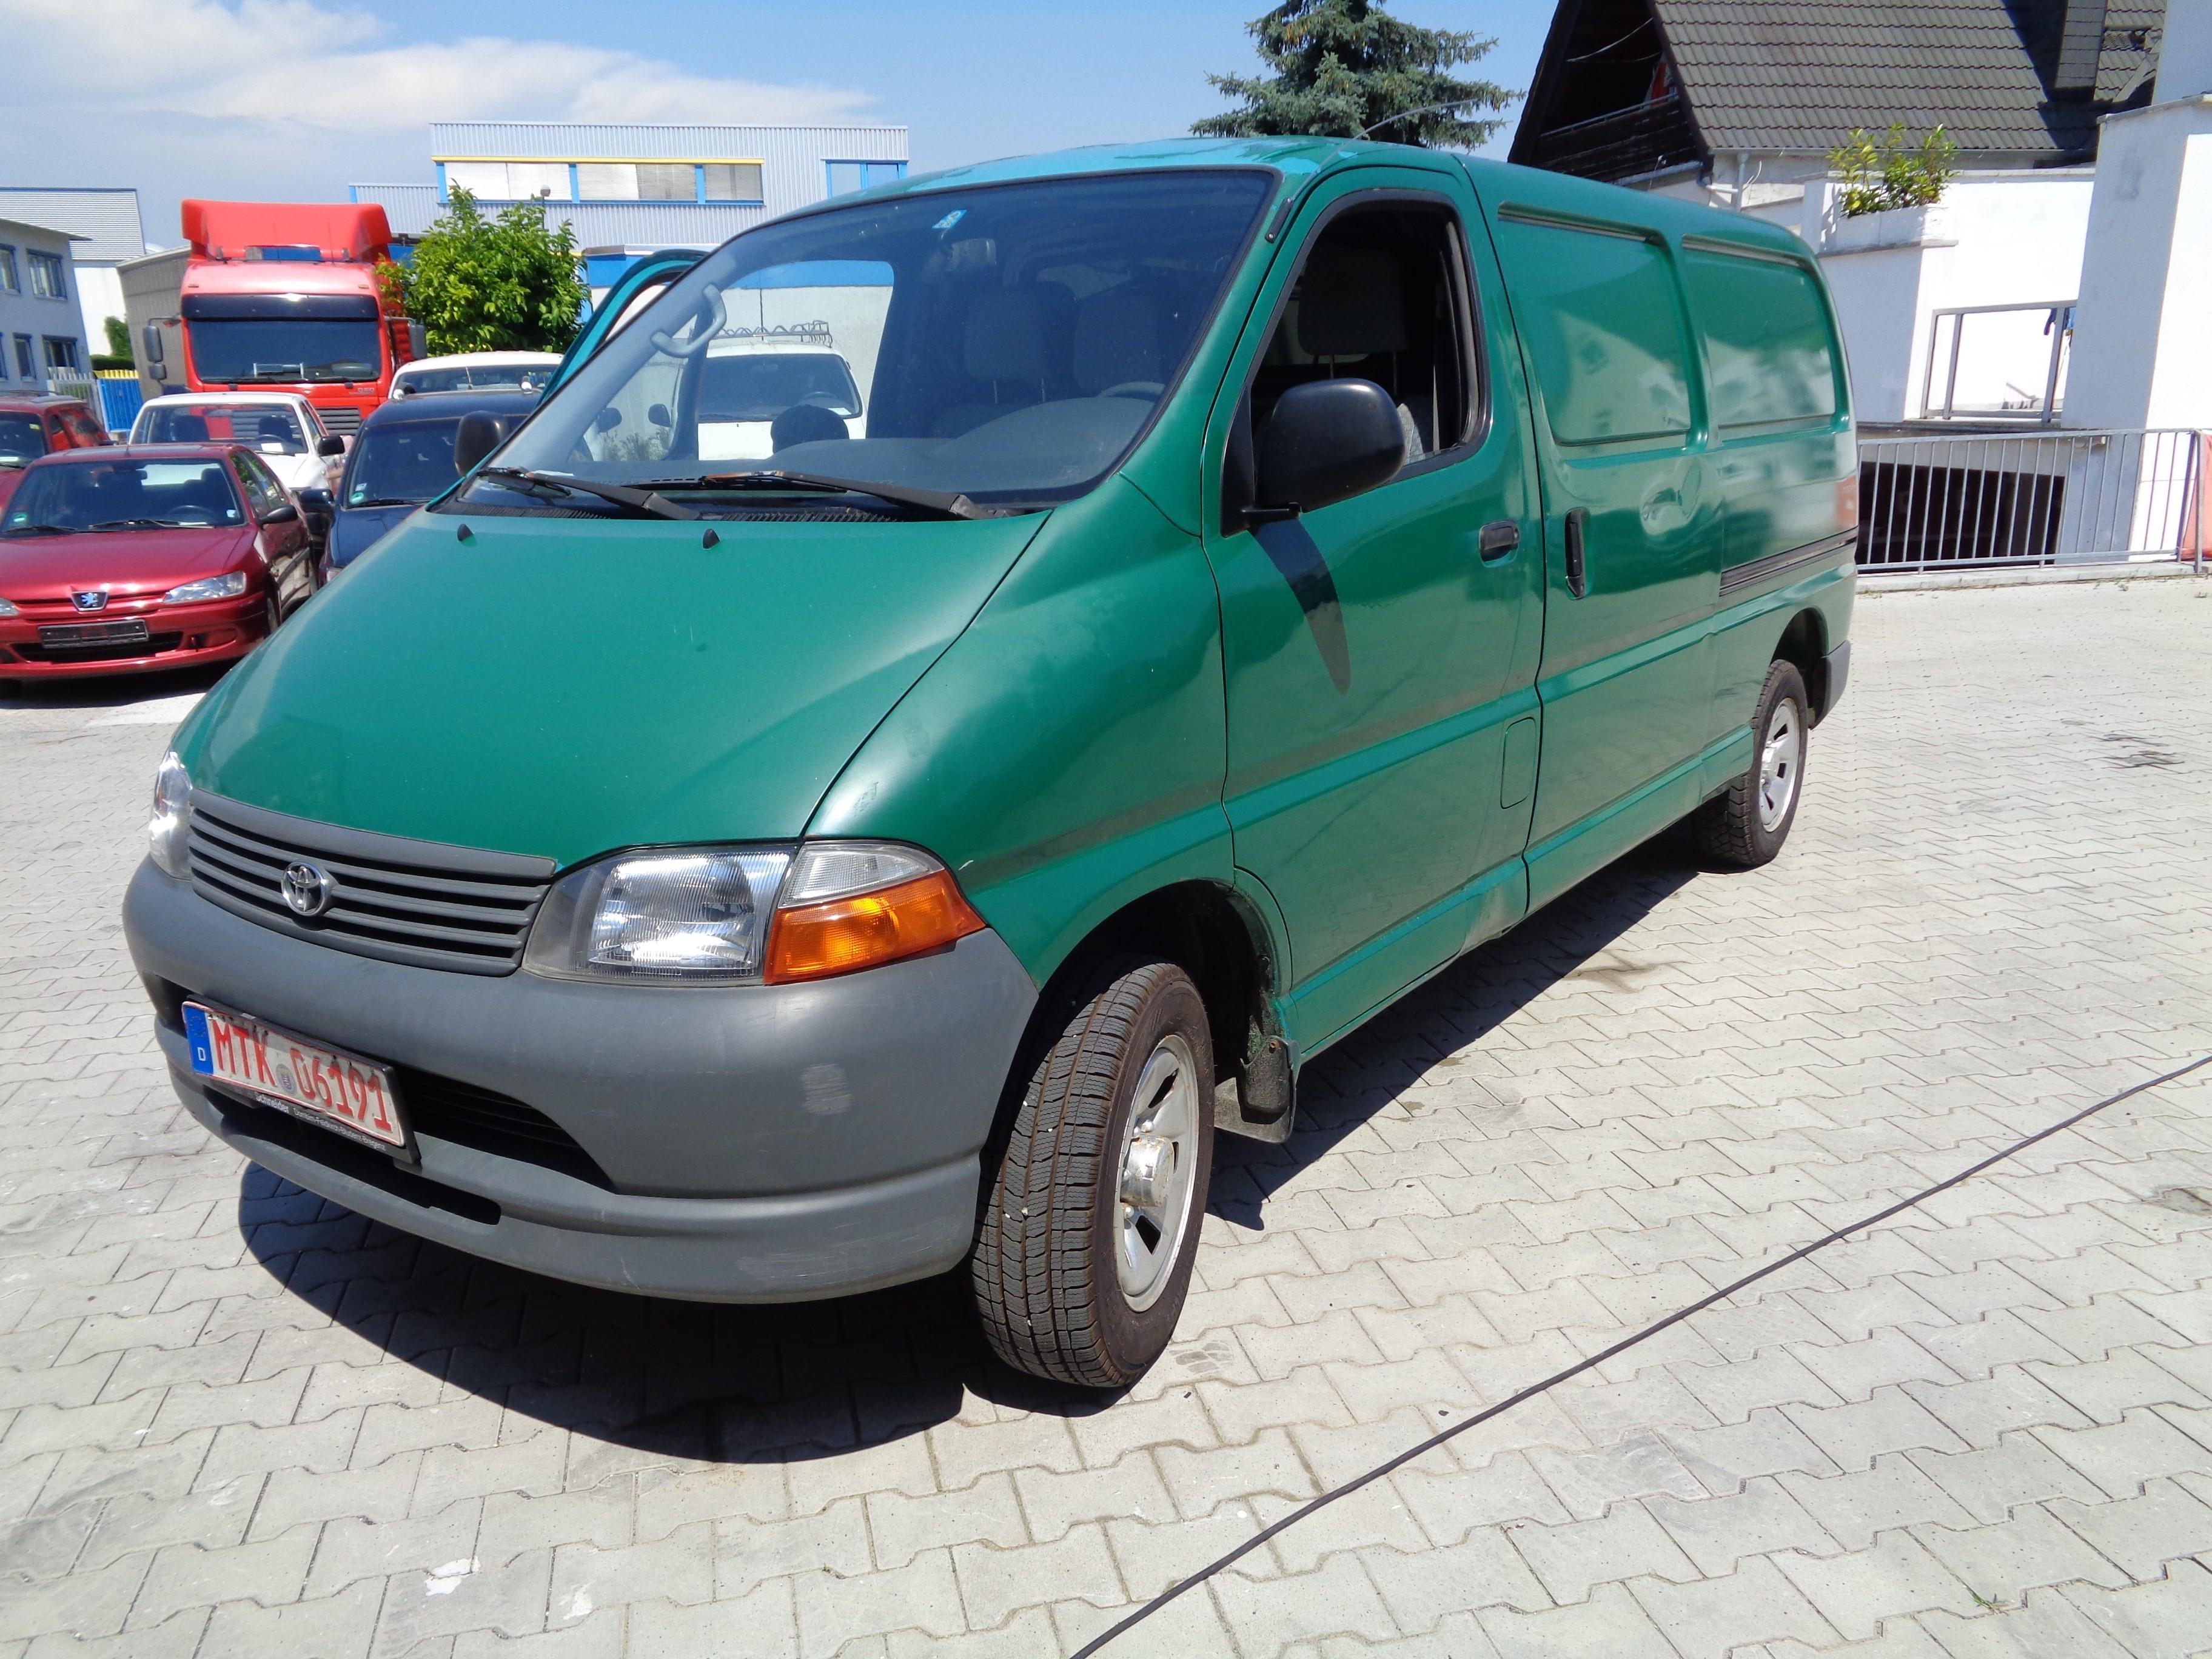 Toyota Hiace Germany - TLK44A